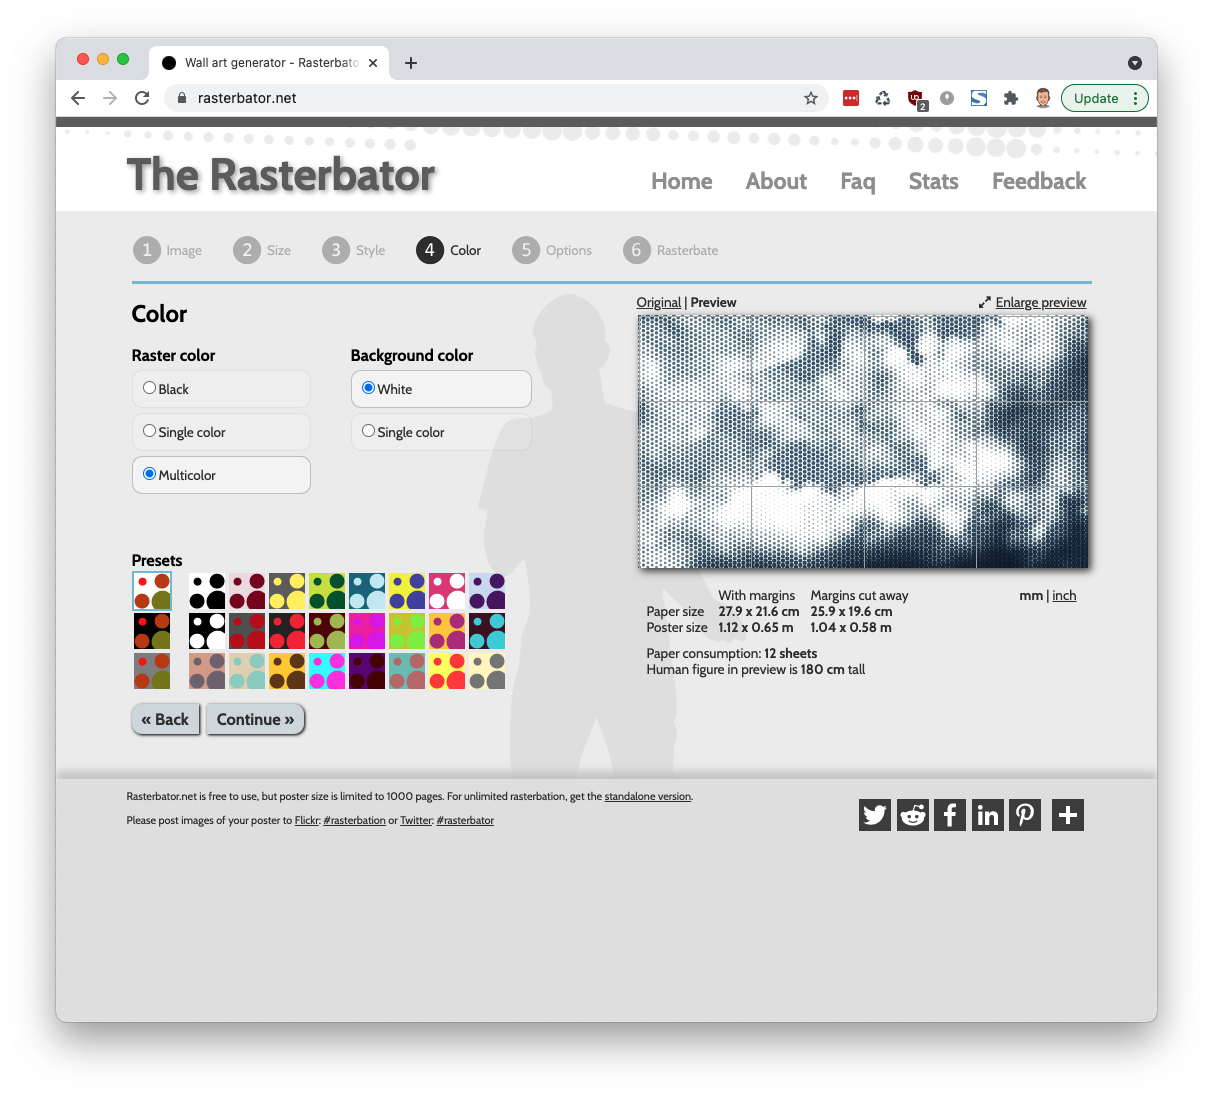 rasterbator website